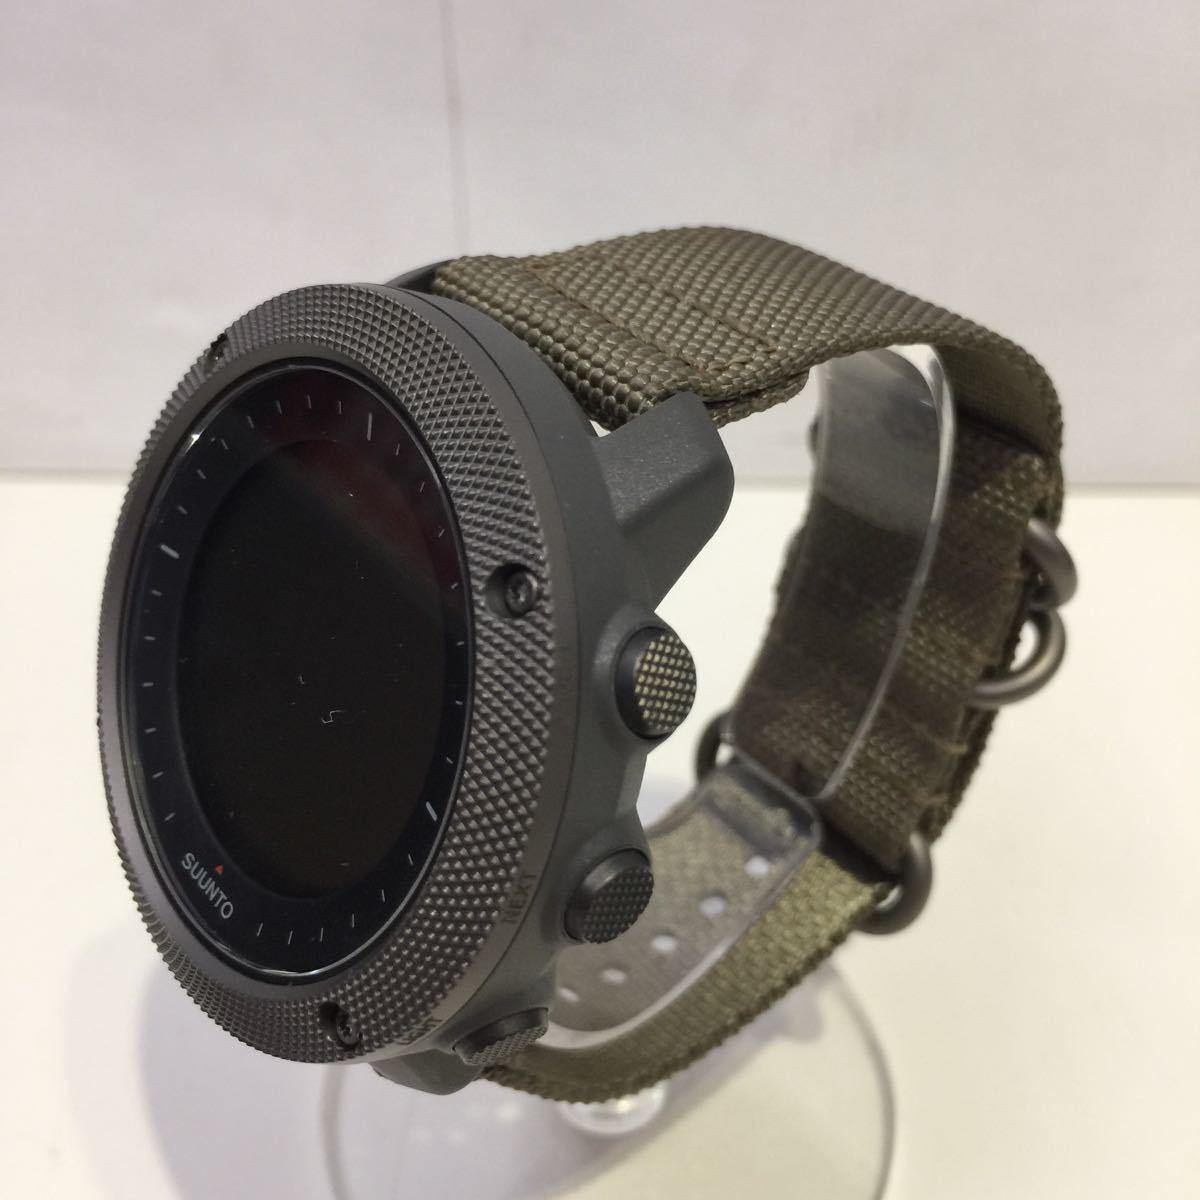 【SUUNTO スント】トラバースアルファフォリッジ TRAVERSE ALPHA FOLIAGE 腕時計 デジタル腕時計 デジタル アウトドアウォッチ アウトドア_画像3